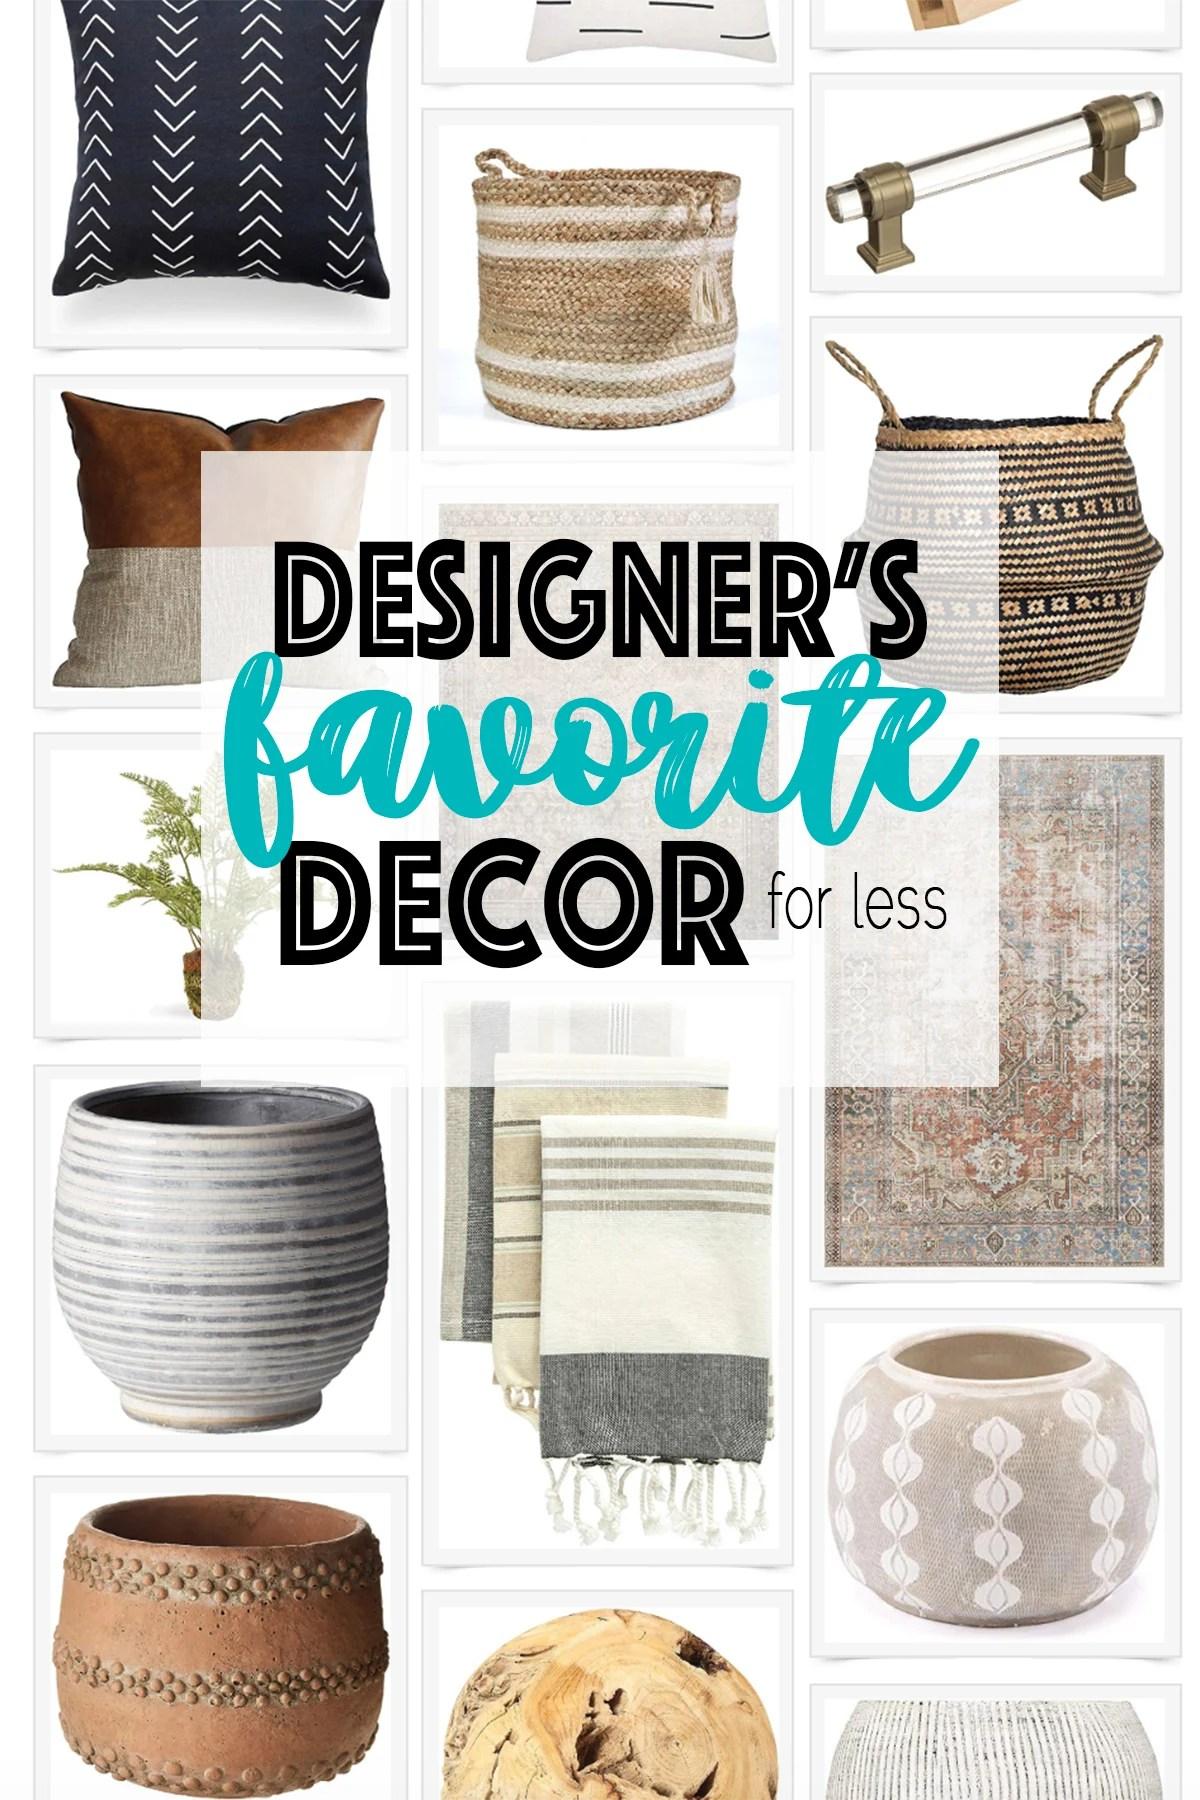 Interior Designer's Favorite Decor for Less